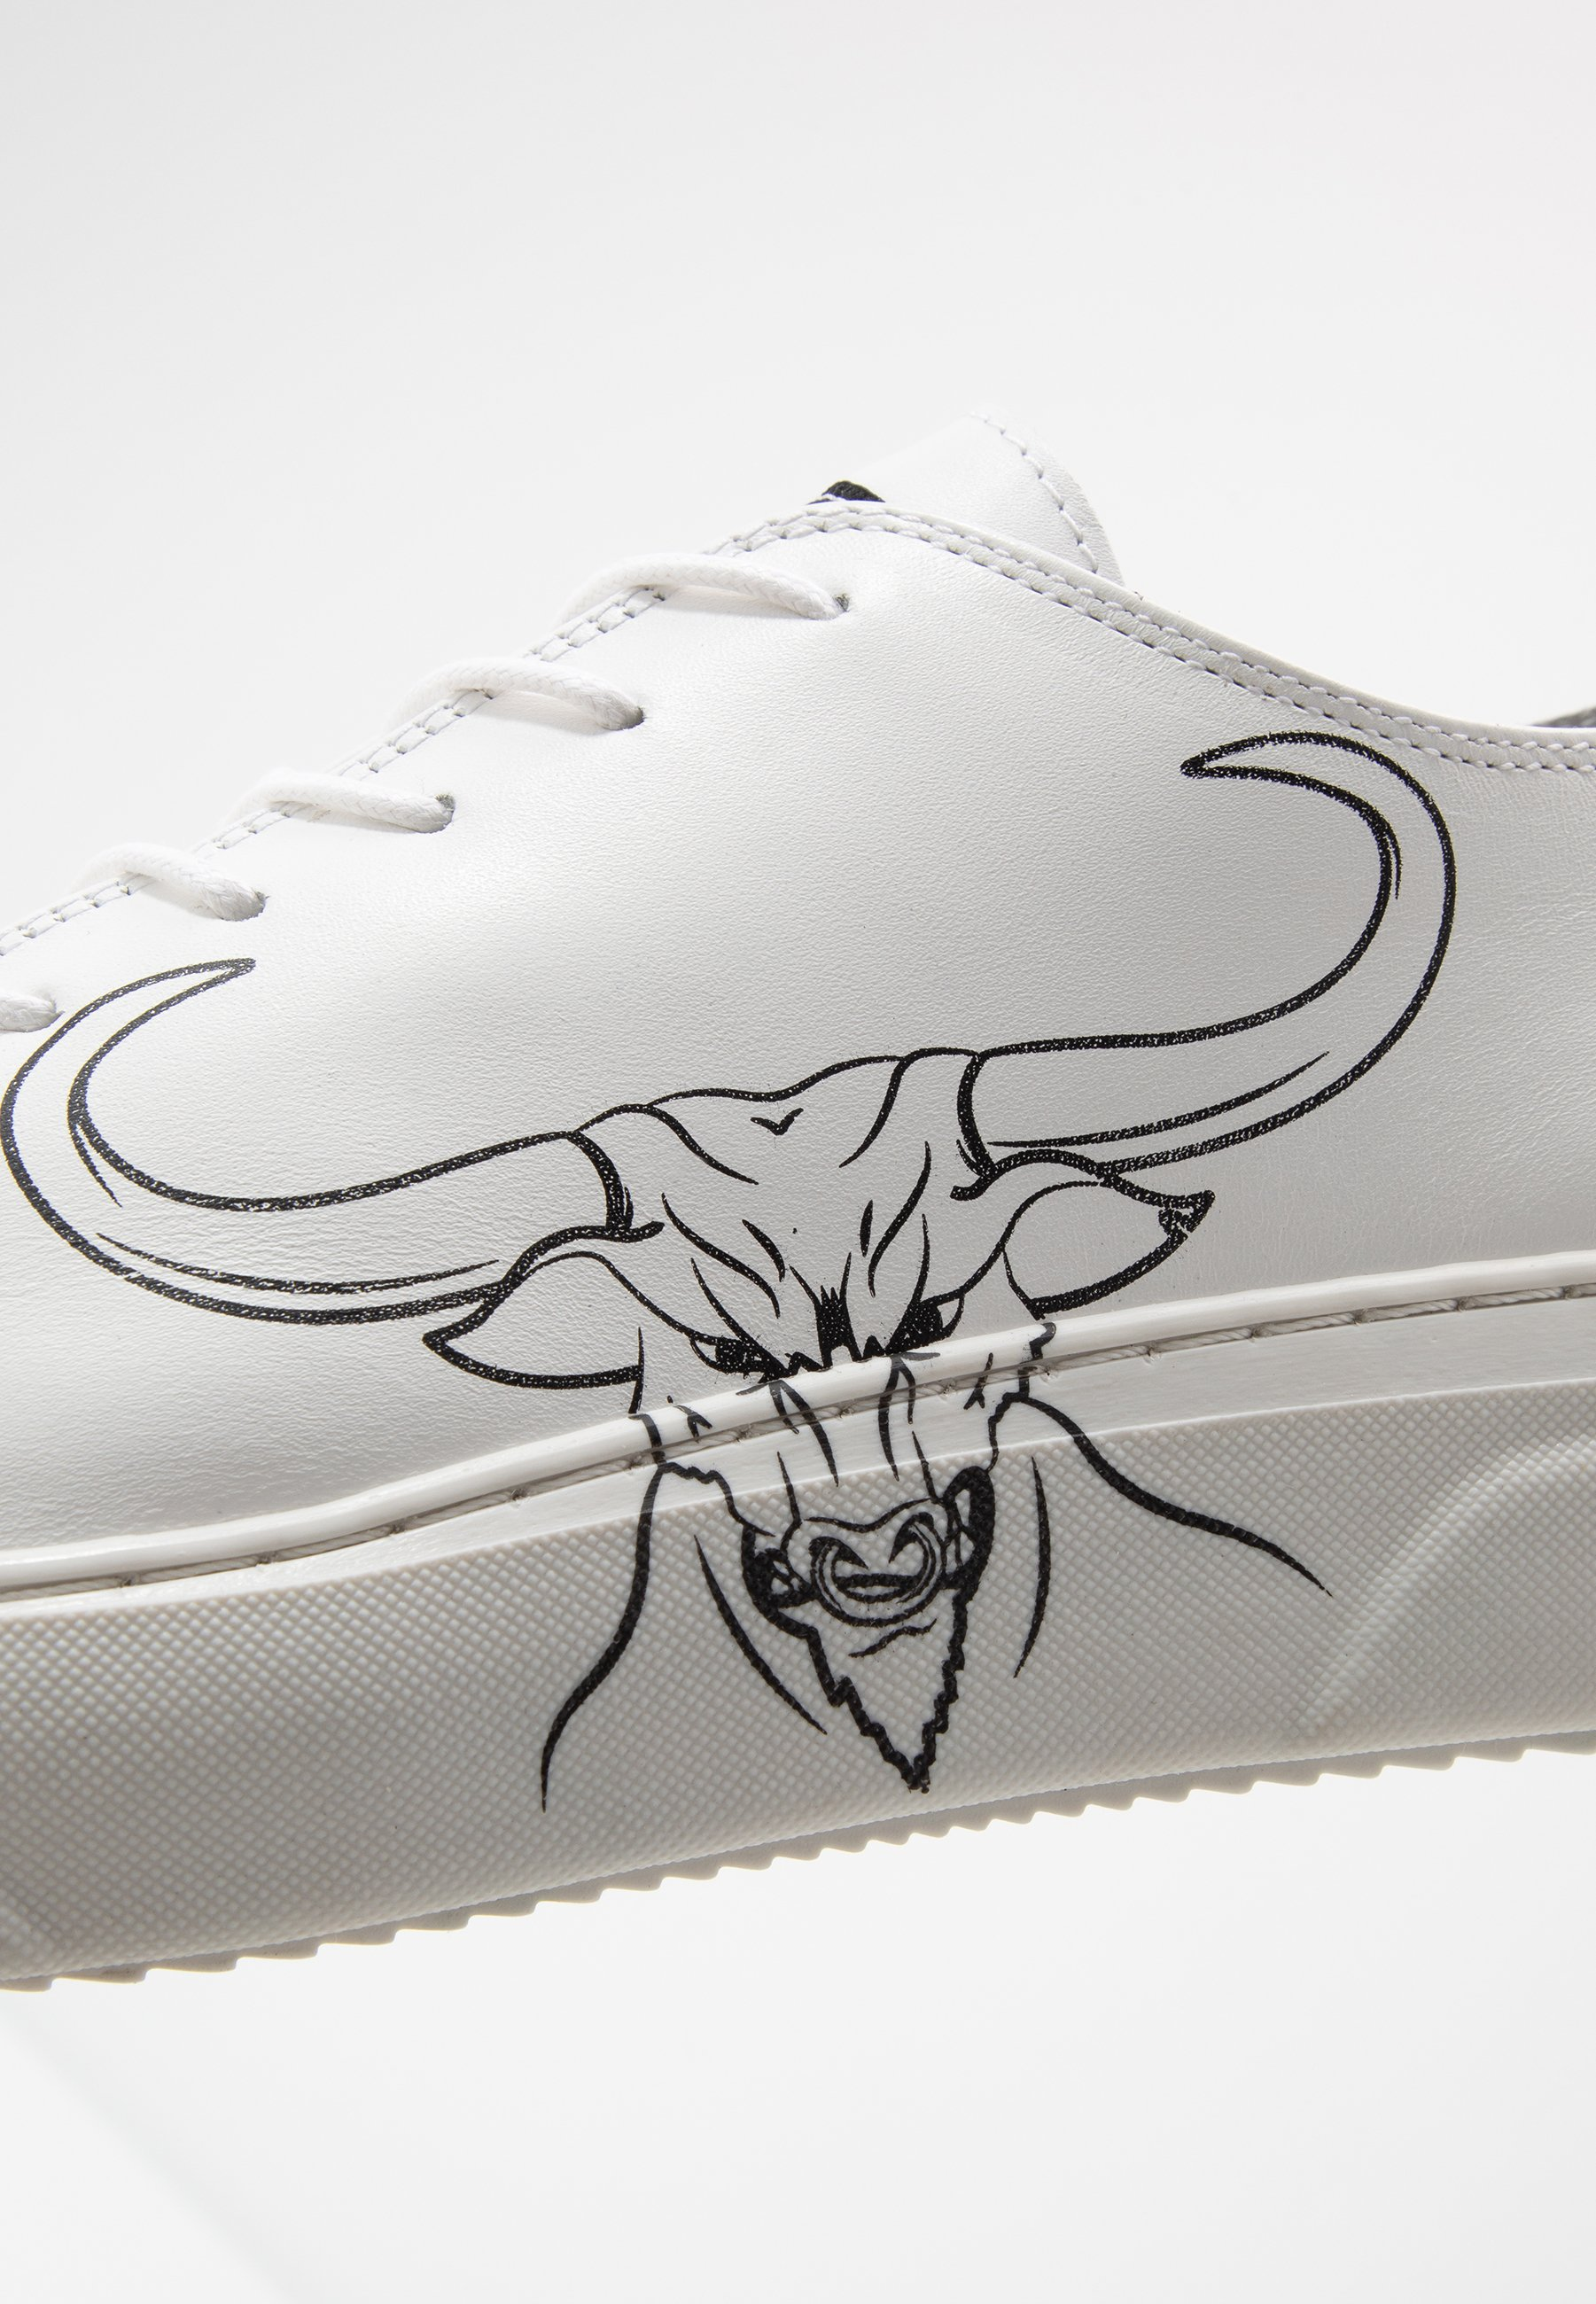 Society Predator - Sneakers White Sauvage